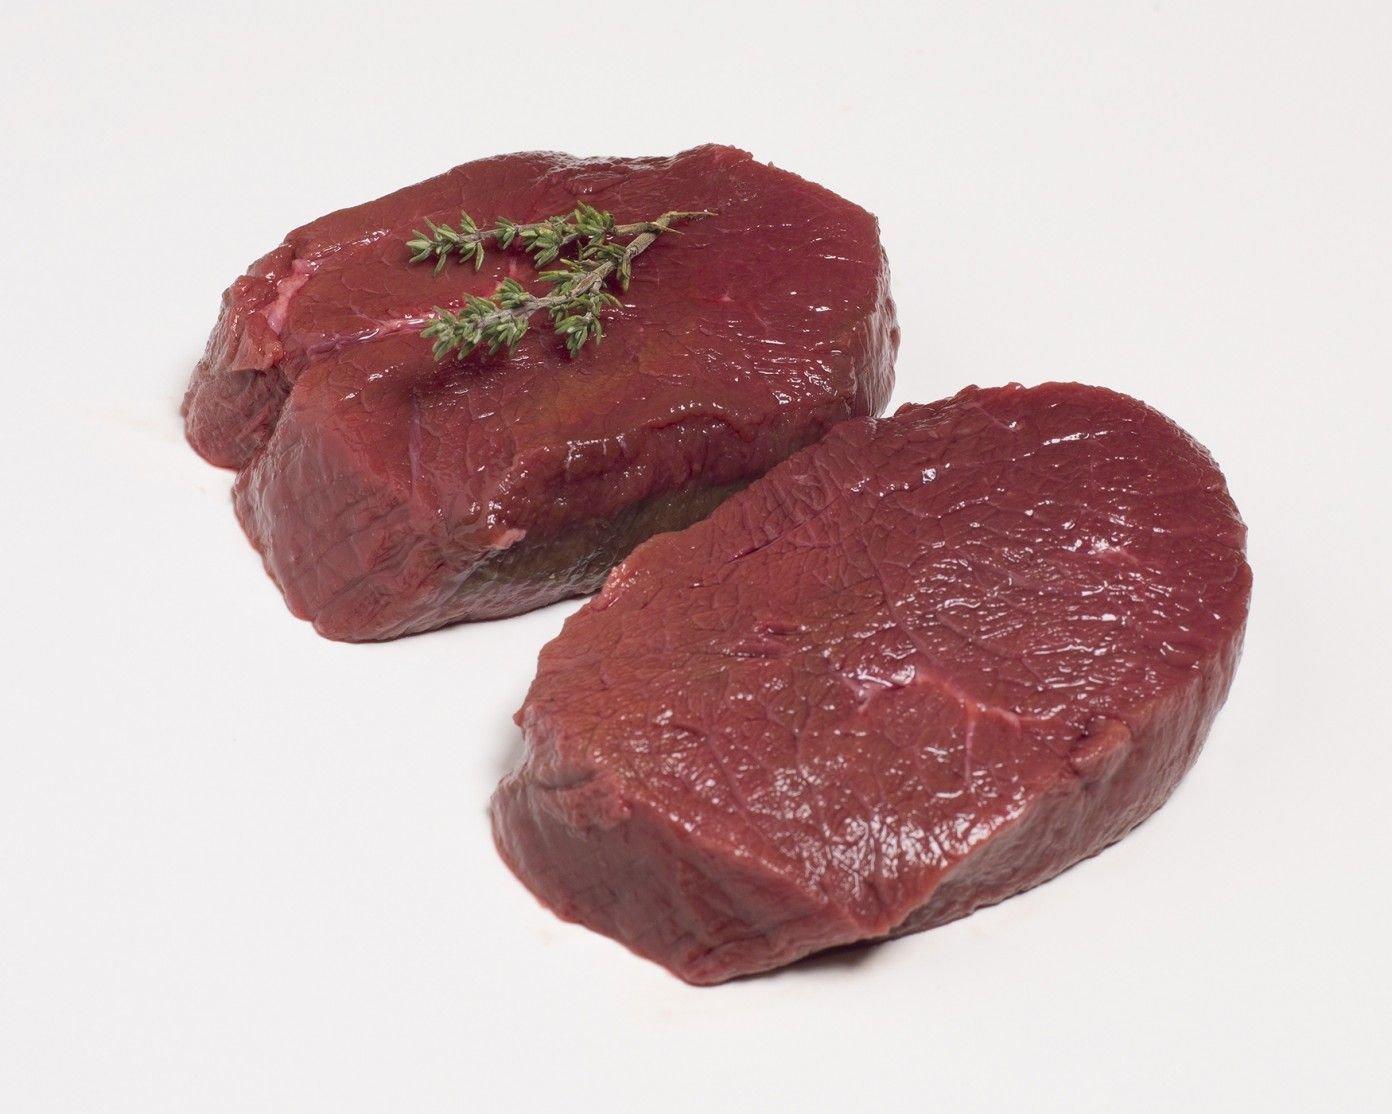 Hert steak 150/180g (prijs per kg)